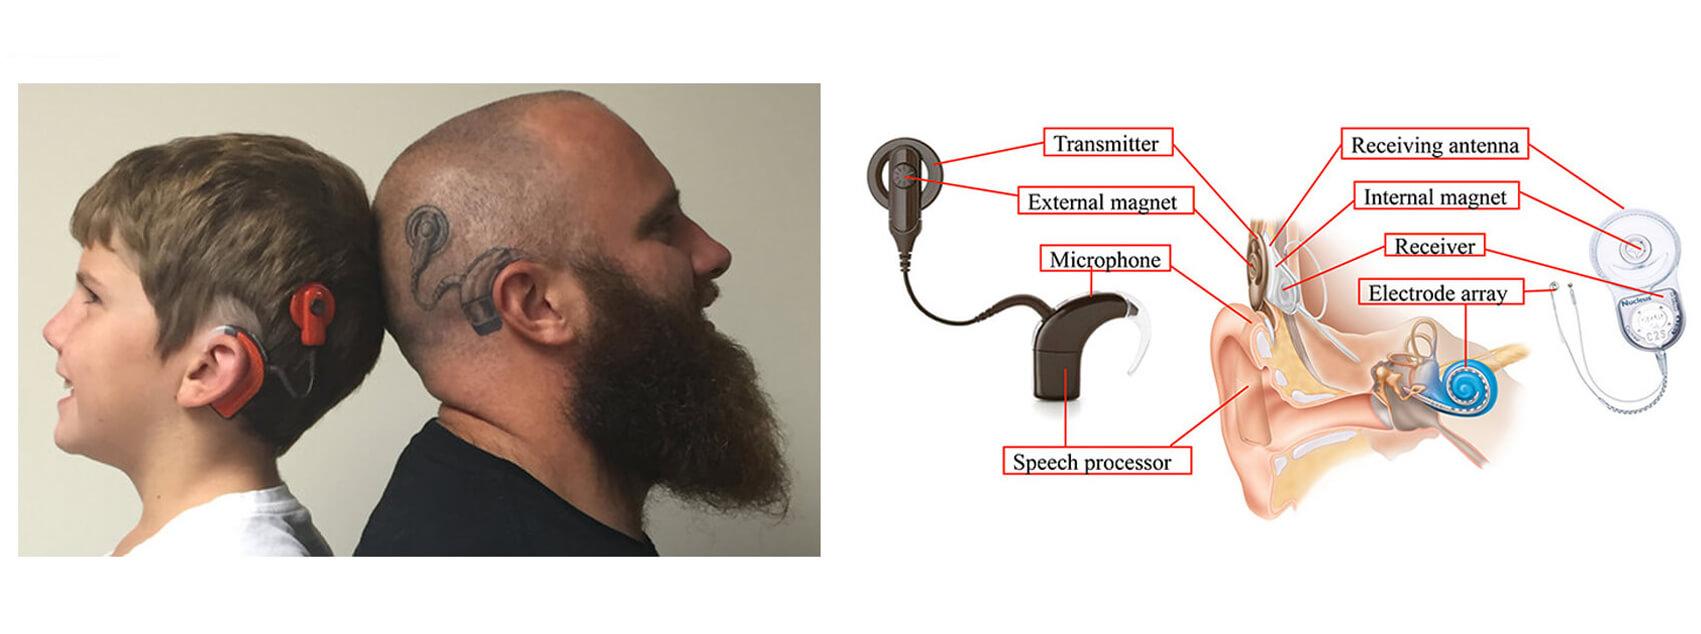 Cochlea-Implantat-Magnete-2